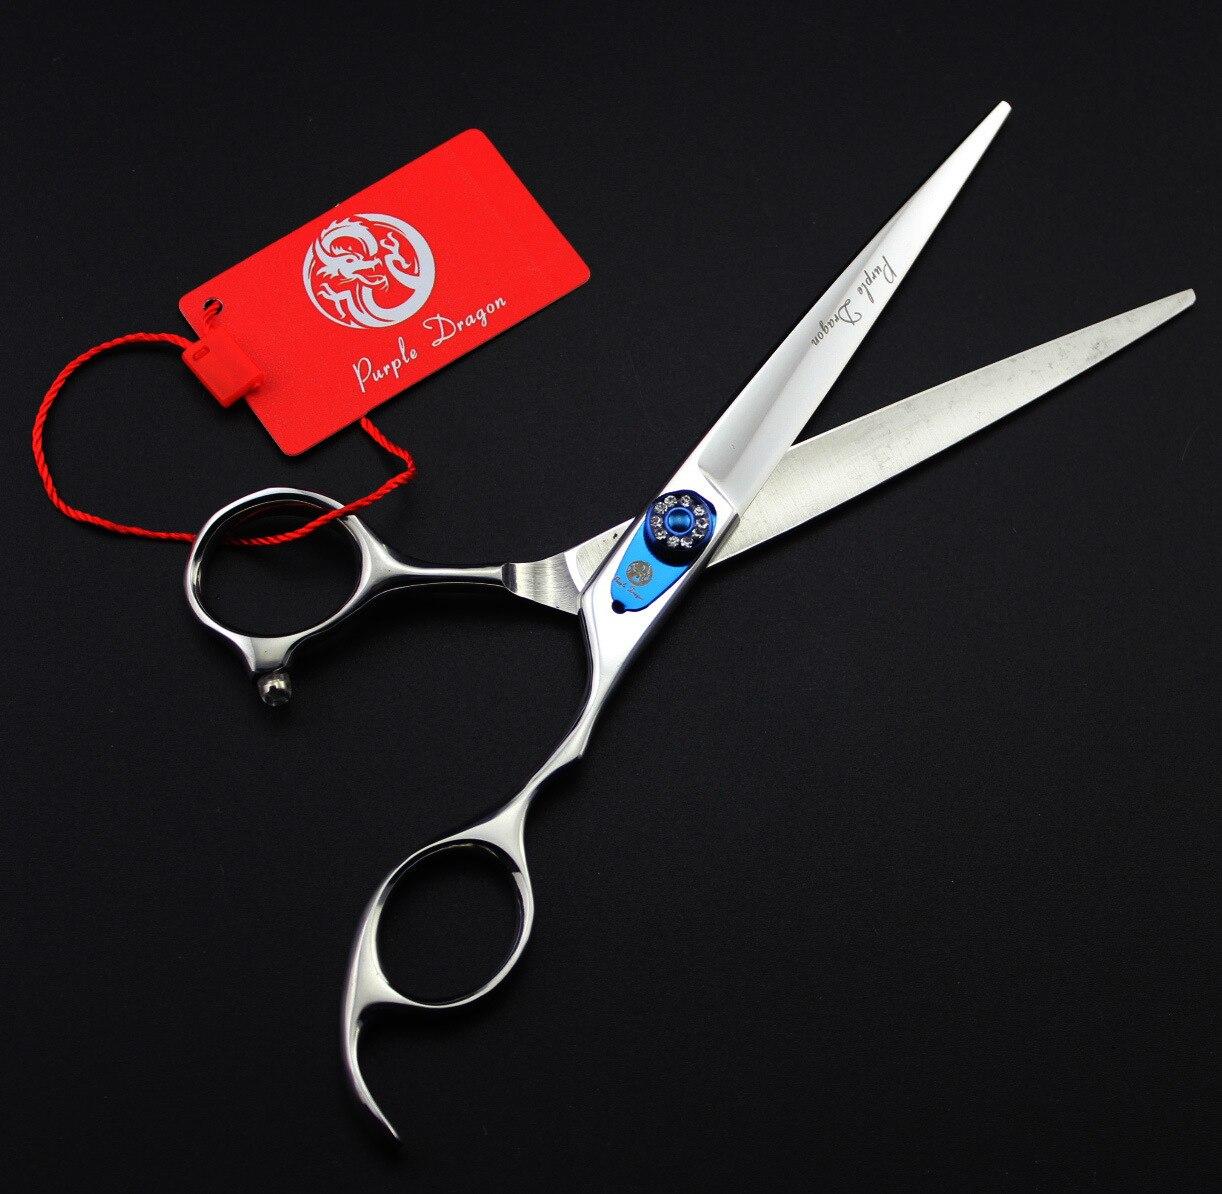 цена на 7 inch Purple Dragon JP440C Dog Grooming Scissors /Shear with bag